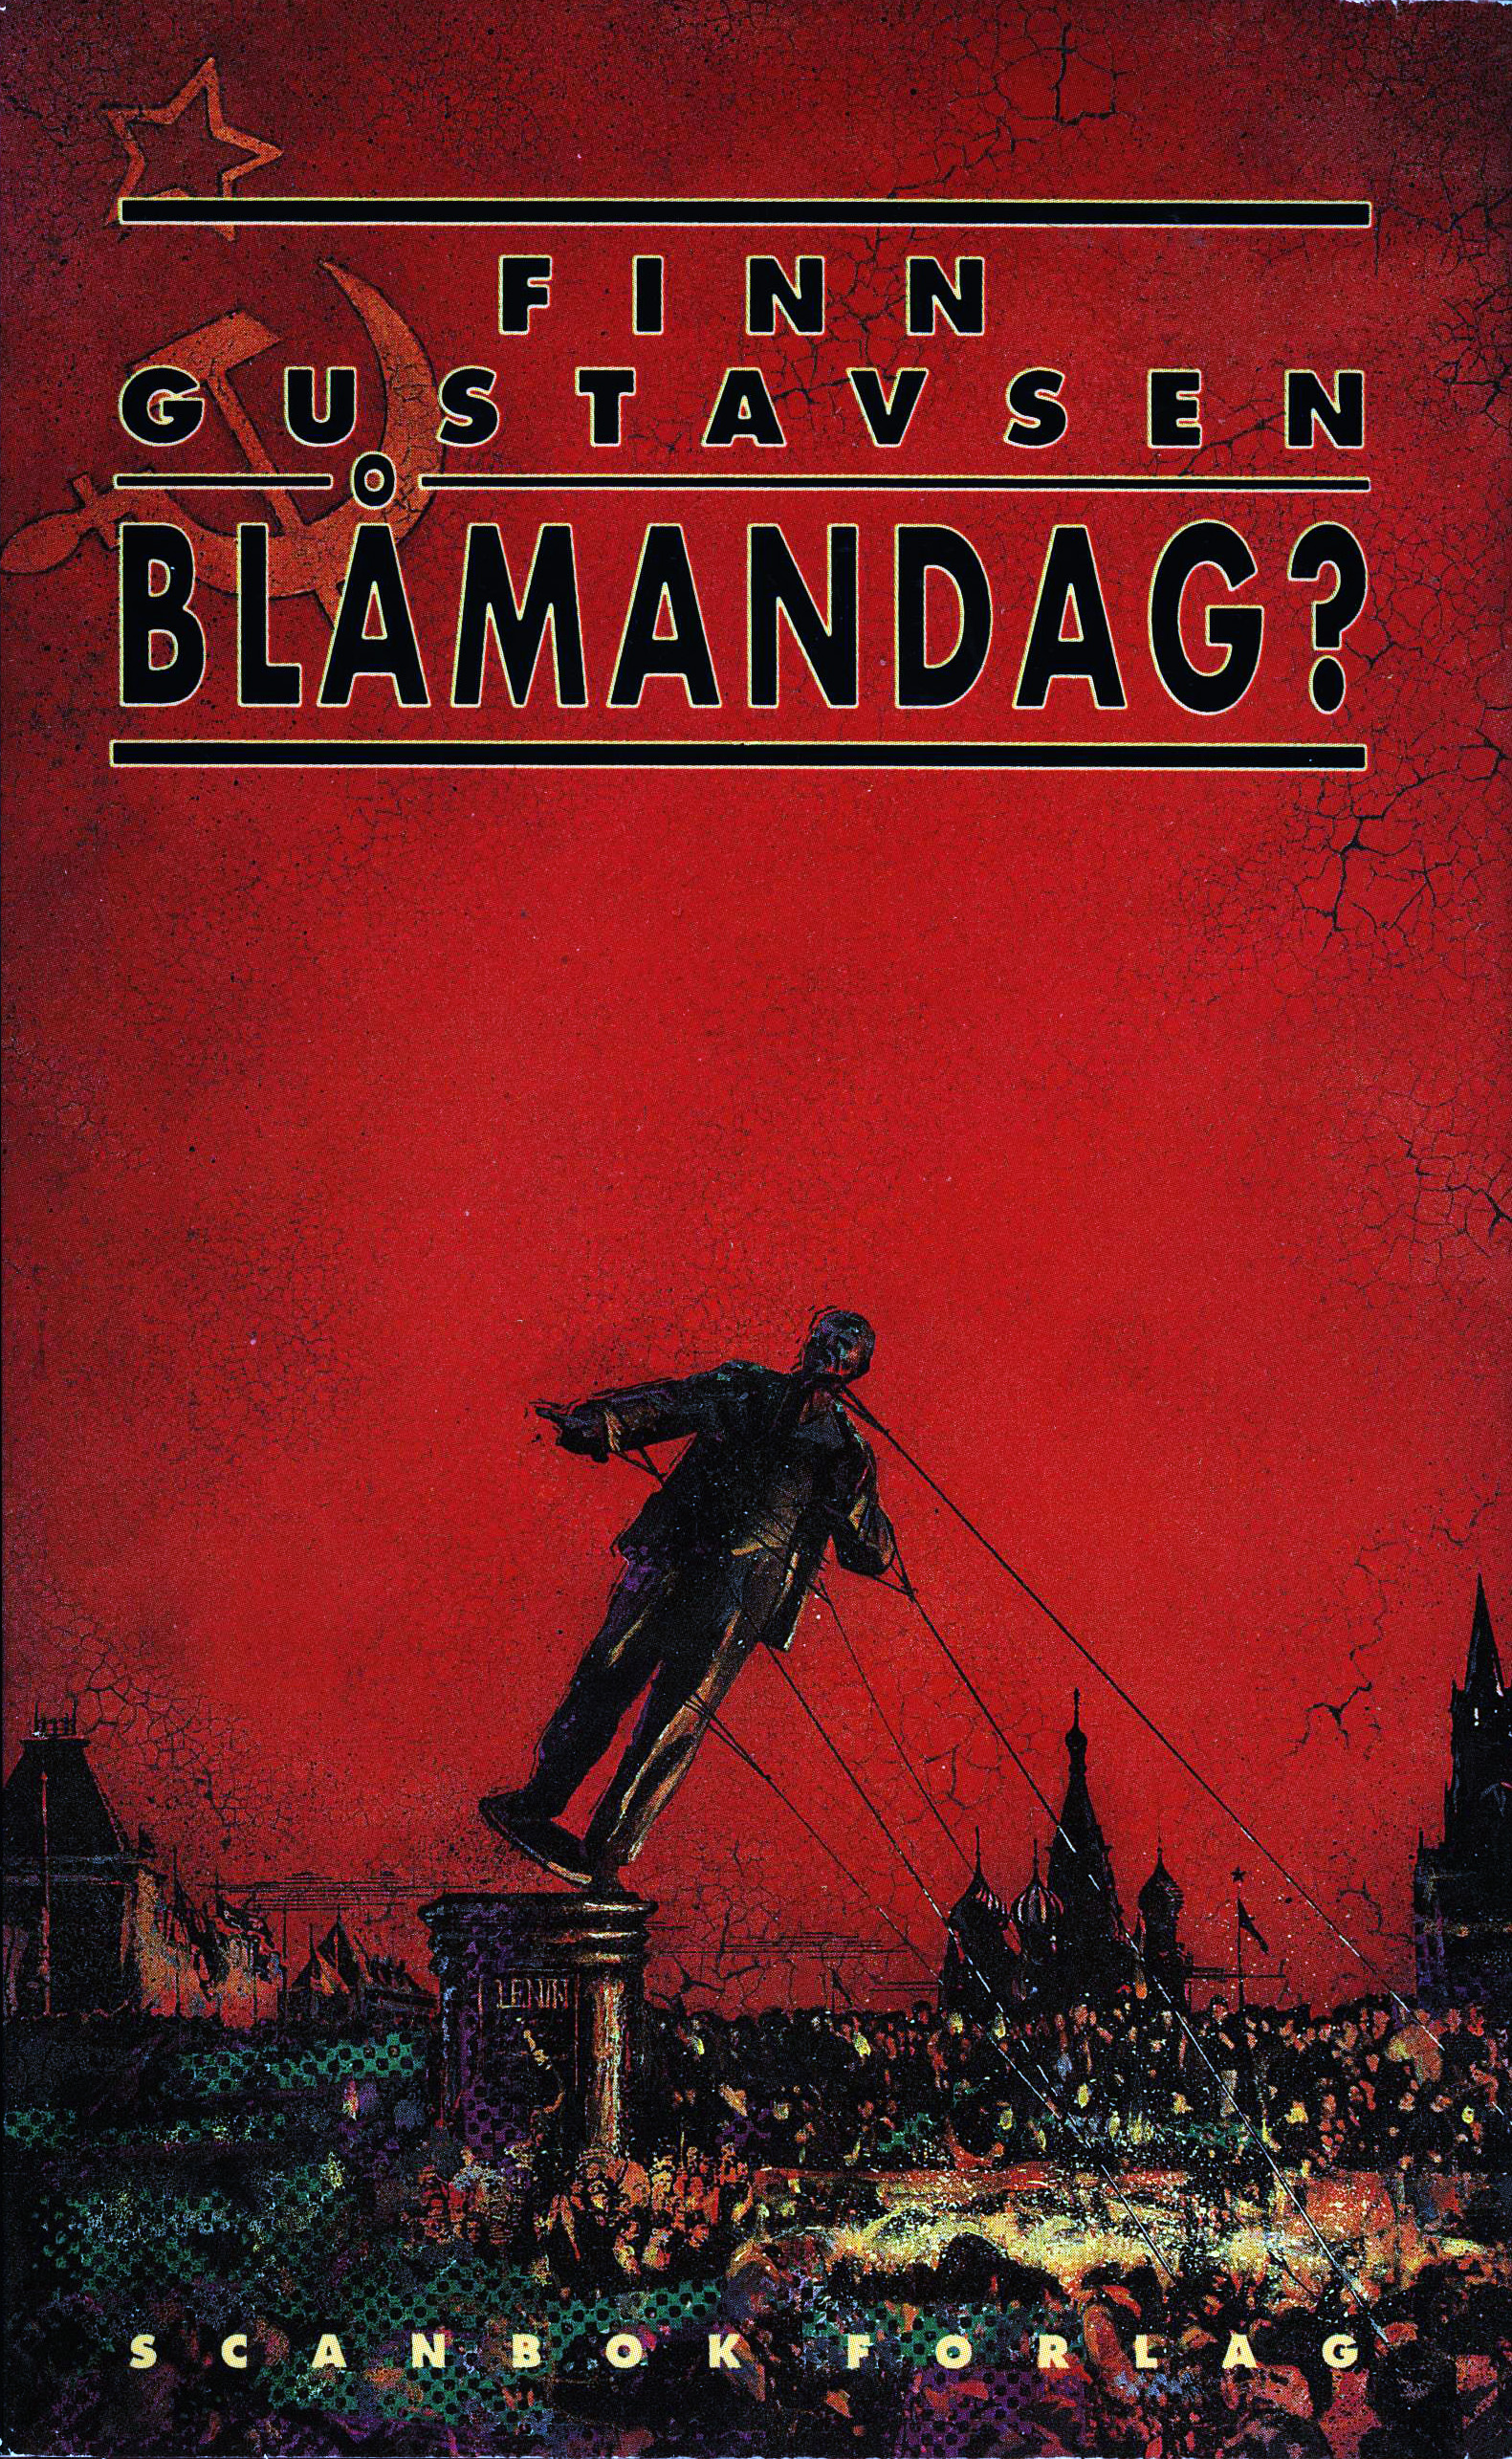 Finn Gustavsen: Blåmandag?